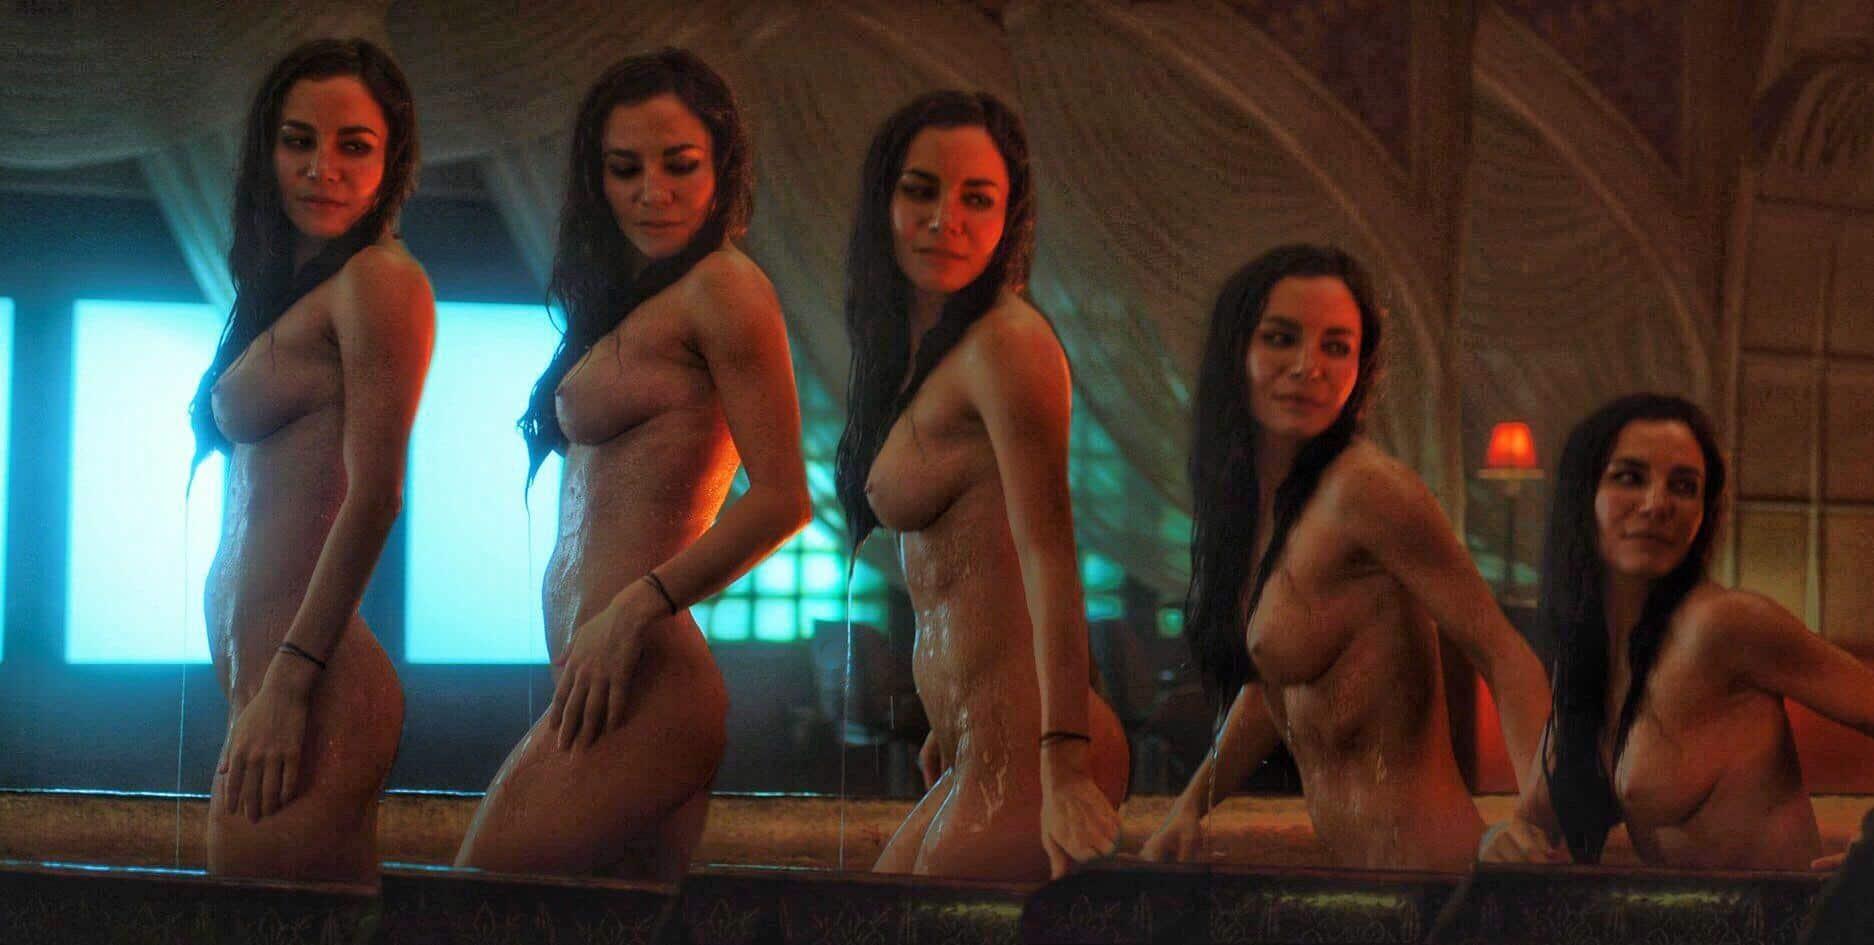 Actriz Porno Marta martha higareda totalmente desnuda